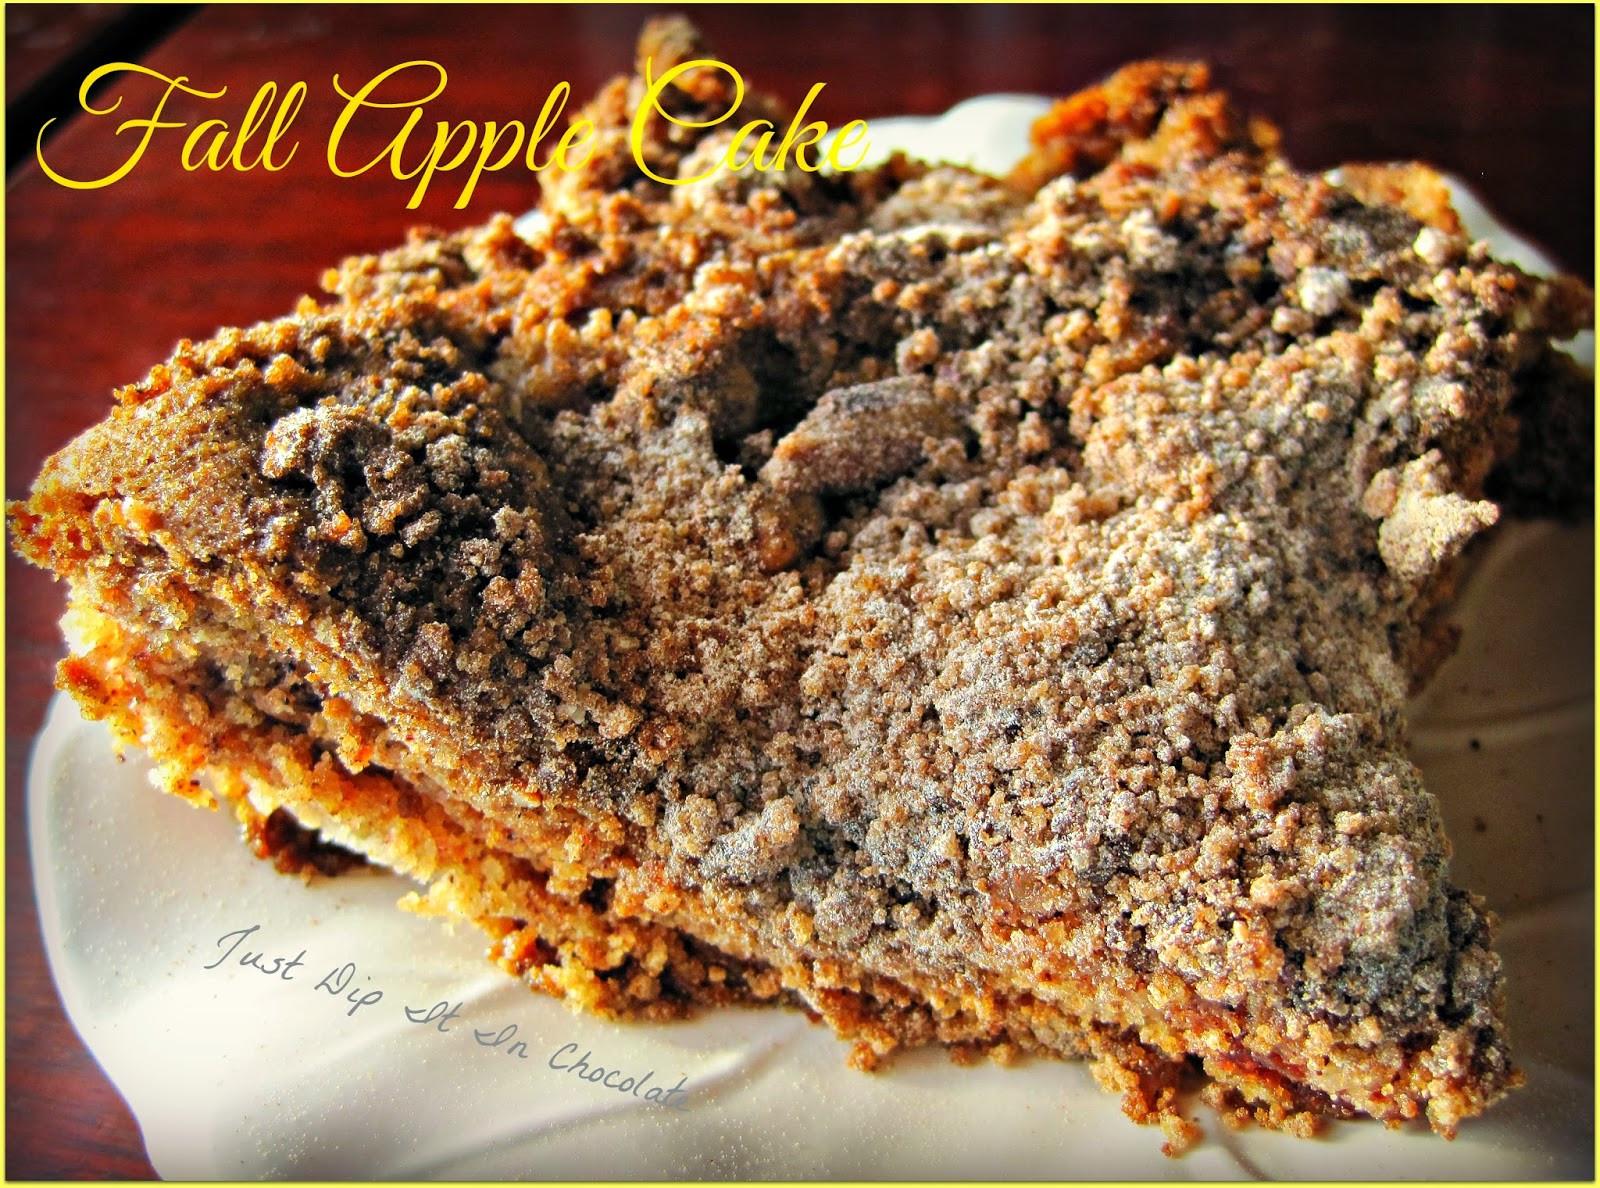 Fall Cake Recipes  Just Dip It In Chocolate Fall Apple Cake Recipe